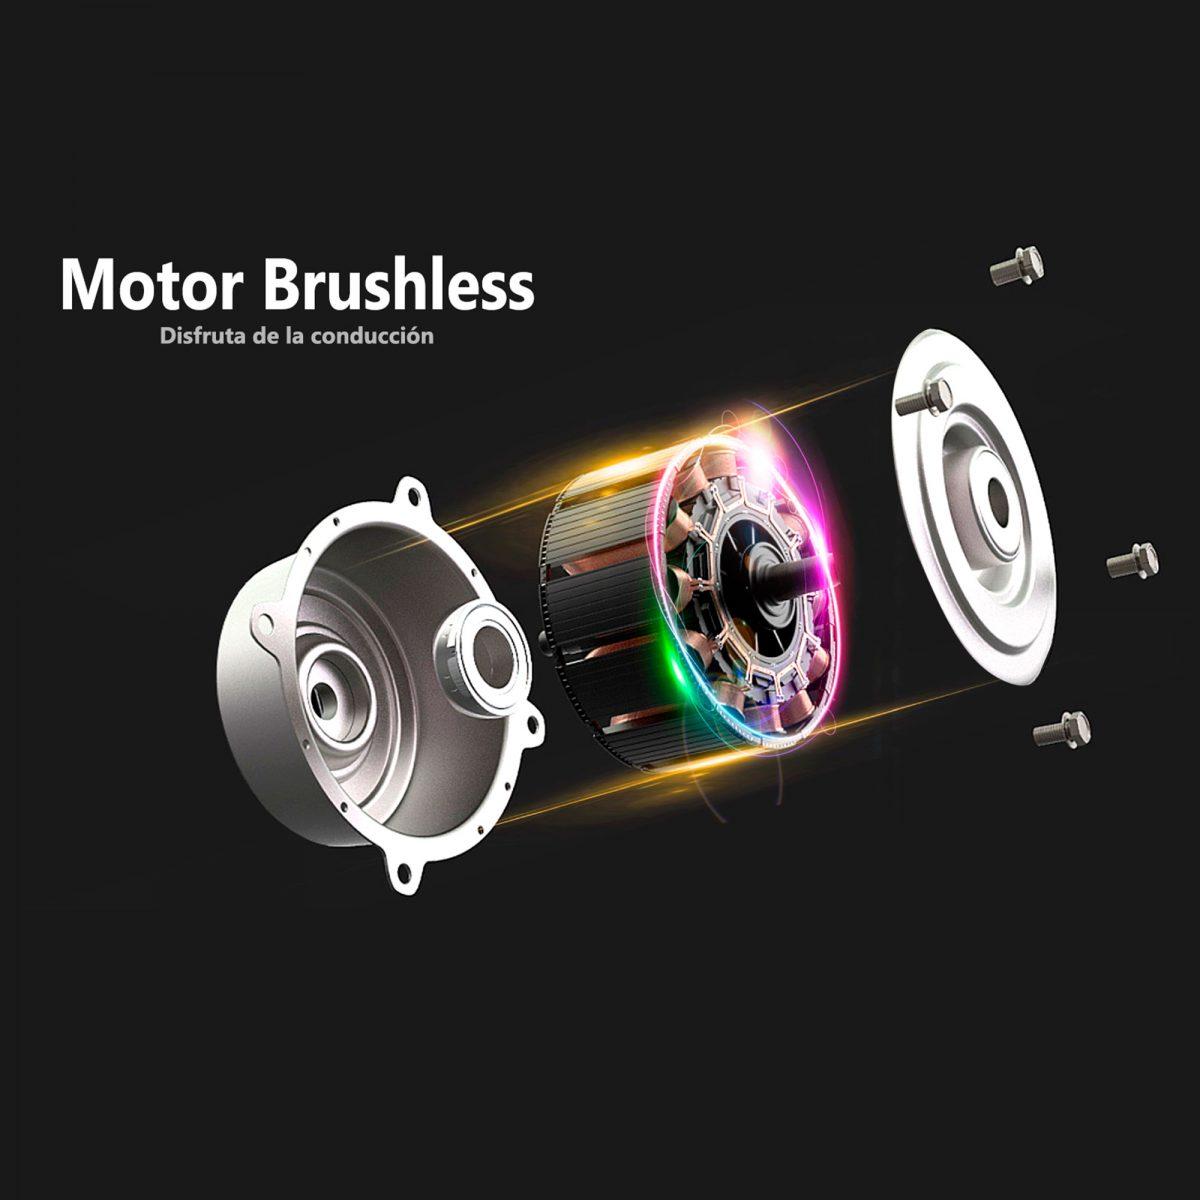 Motor Brushless del patinete eléctrico - Zwheel